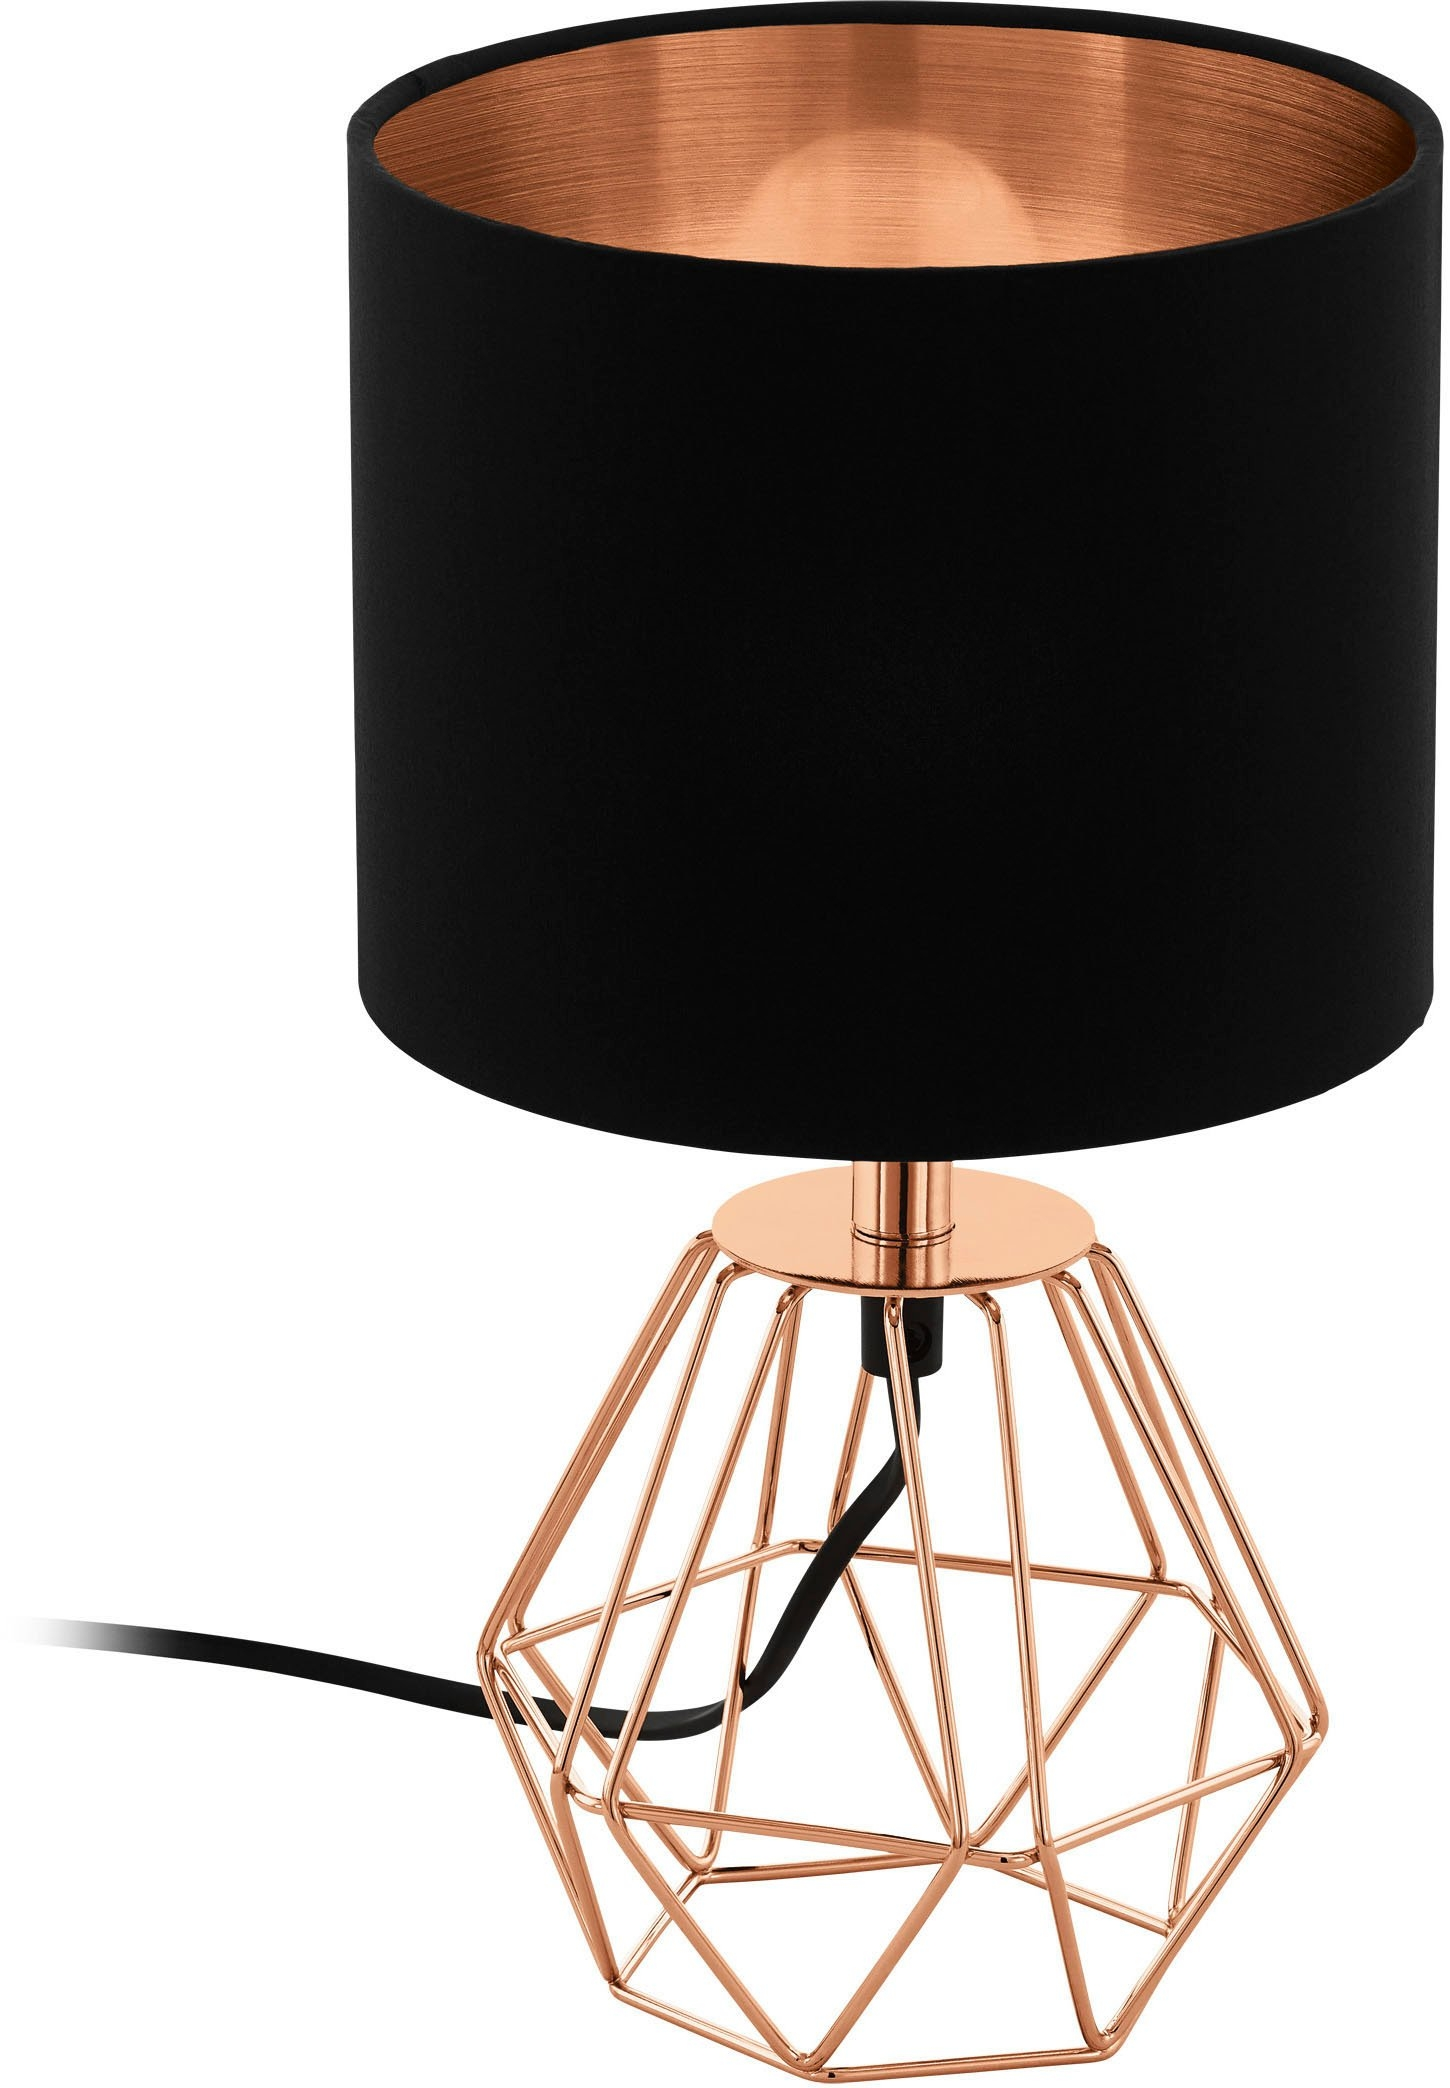 EGLO tafellamp CARLTON 2 nu online kopen bij OTTO